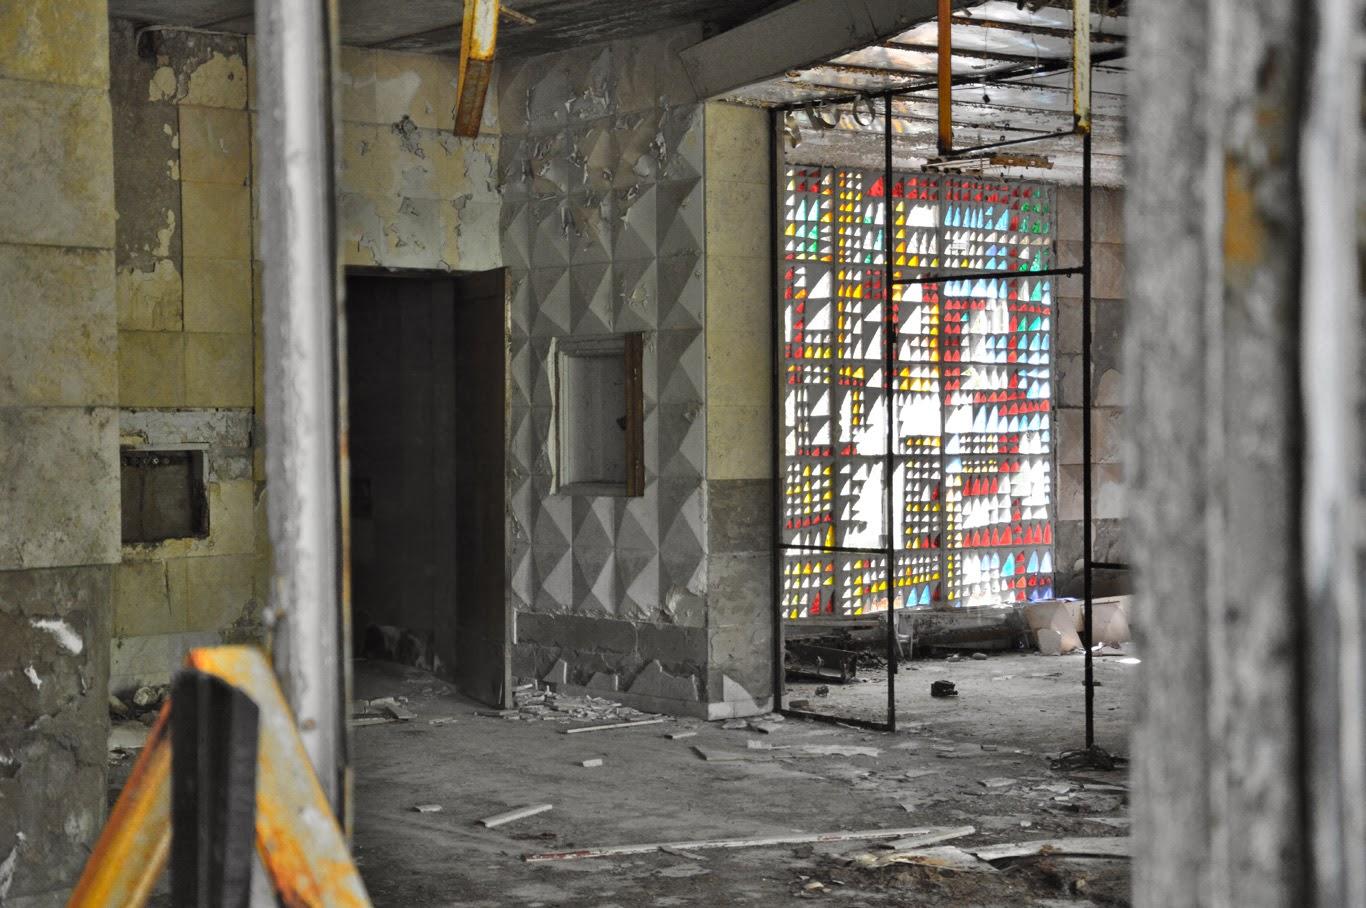 chernobyl disaster ghost town ukraine czernobyl prypeć